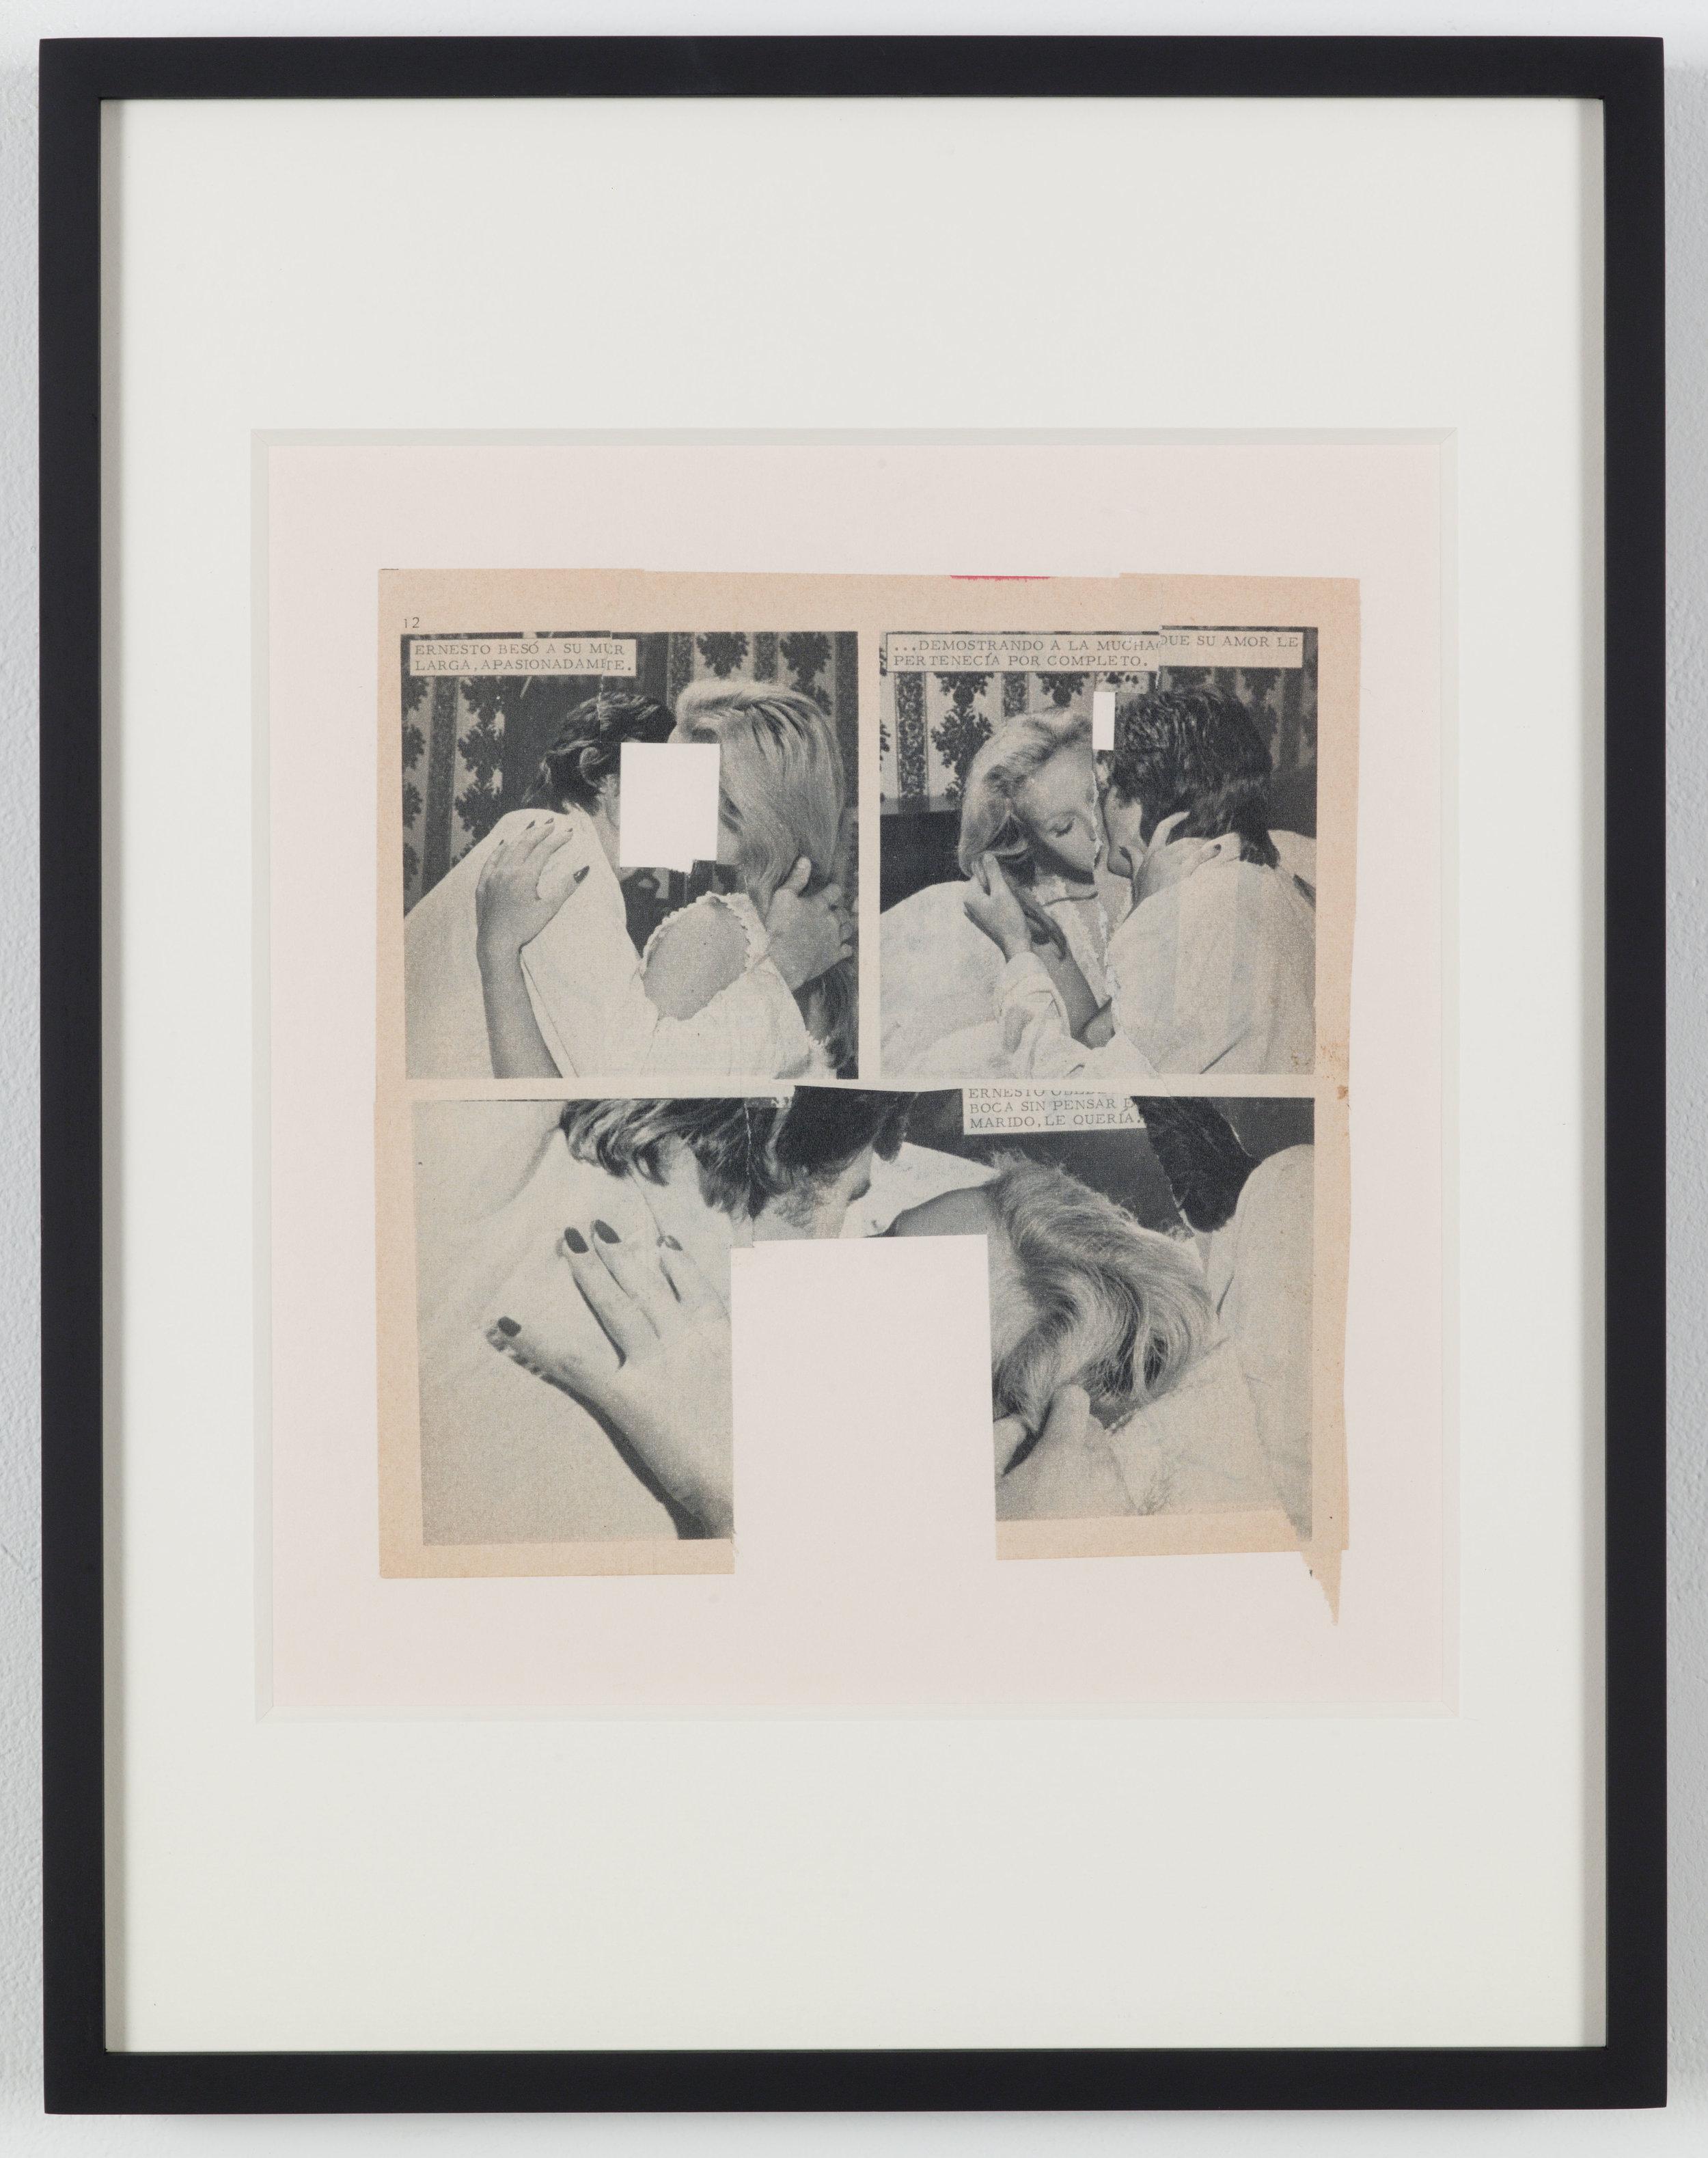 Untitled (Photoroman), 1977, Collage © John Stezaker & Petzel Gallery